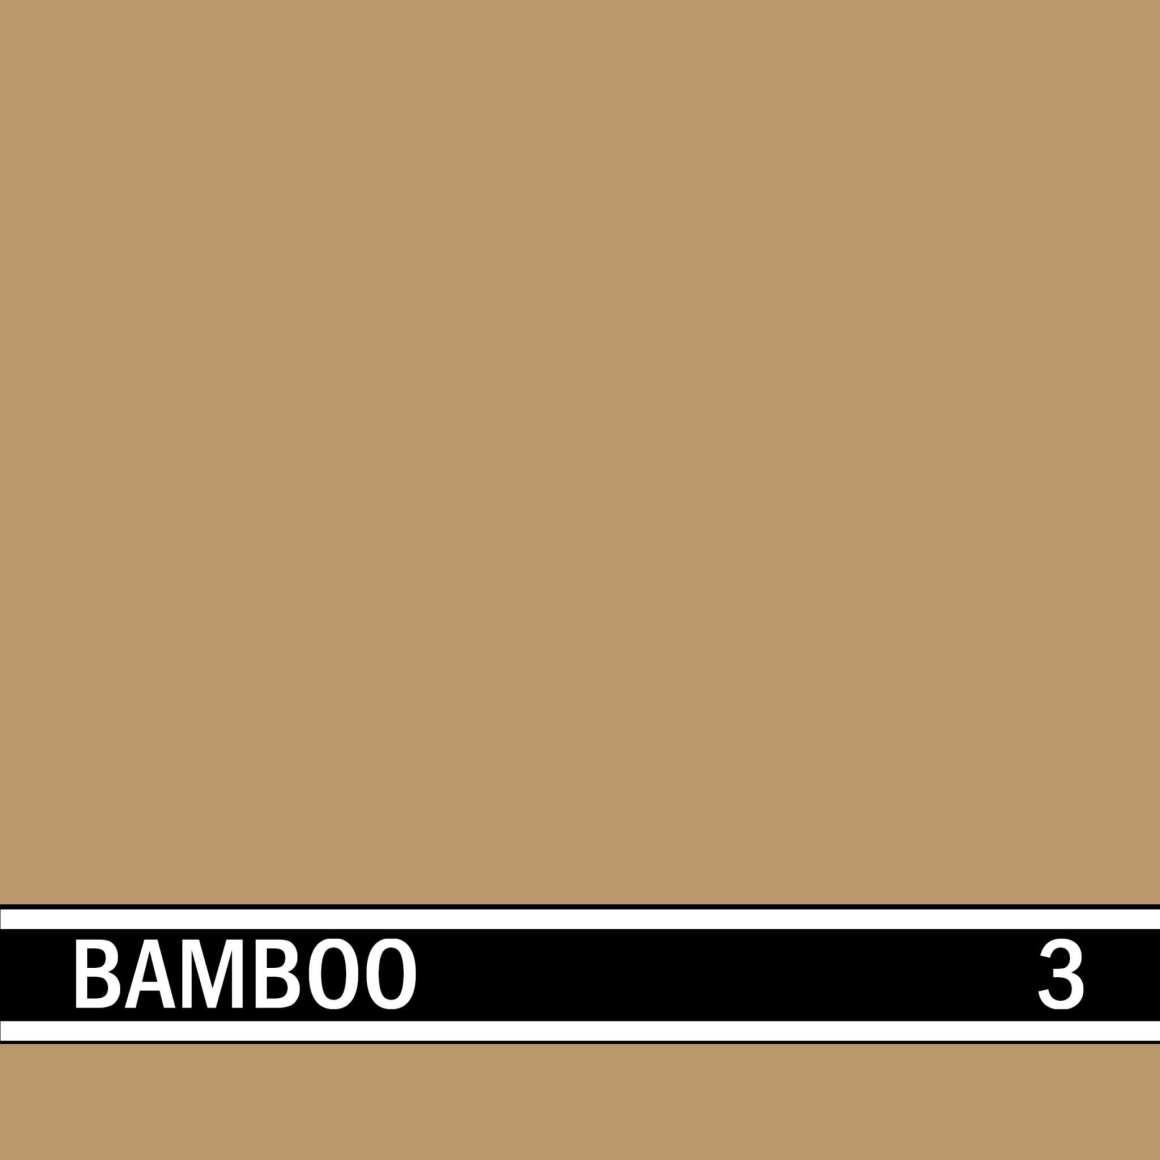 Bamboo integral concrete color for stamped concrete and decorative colored concrete